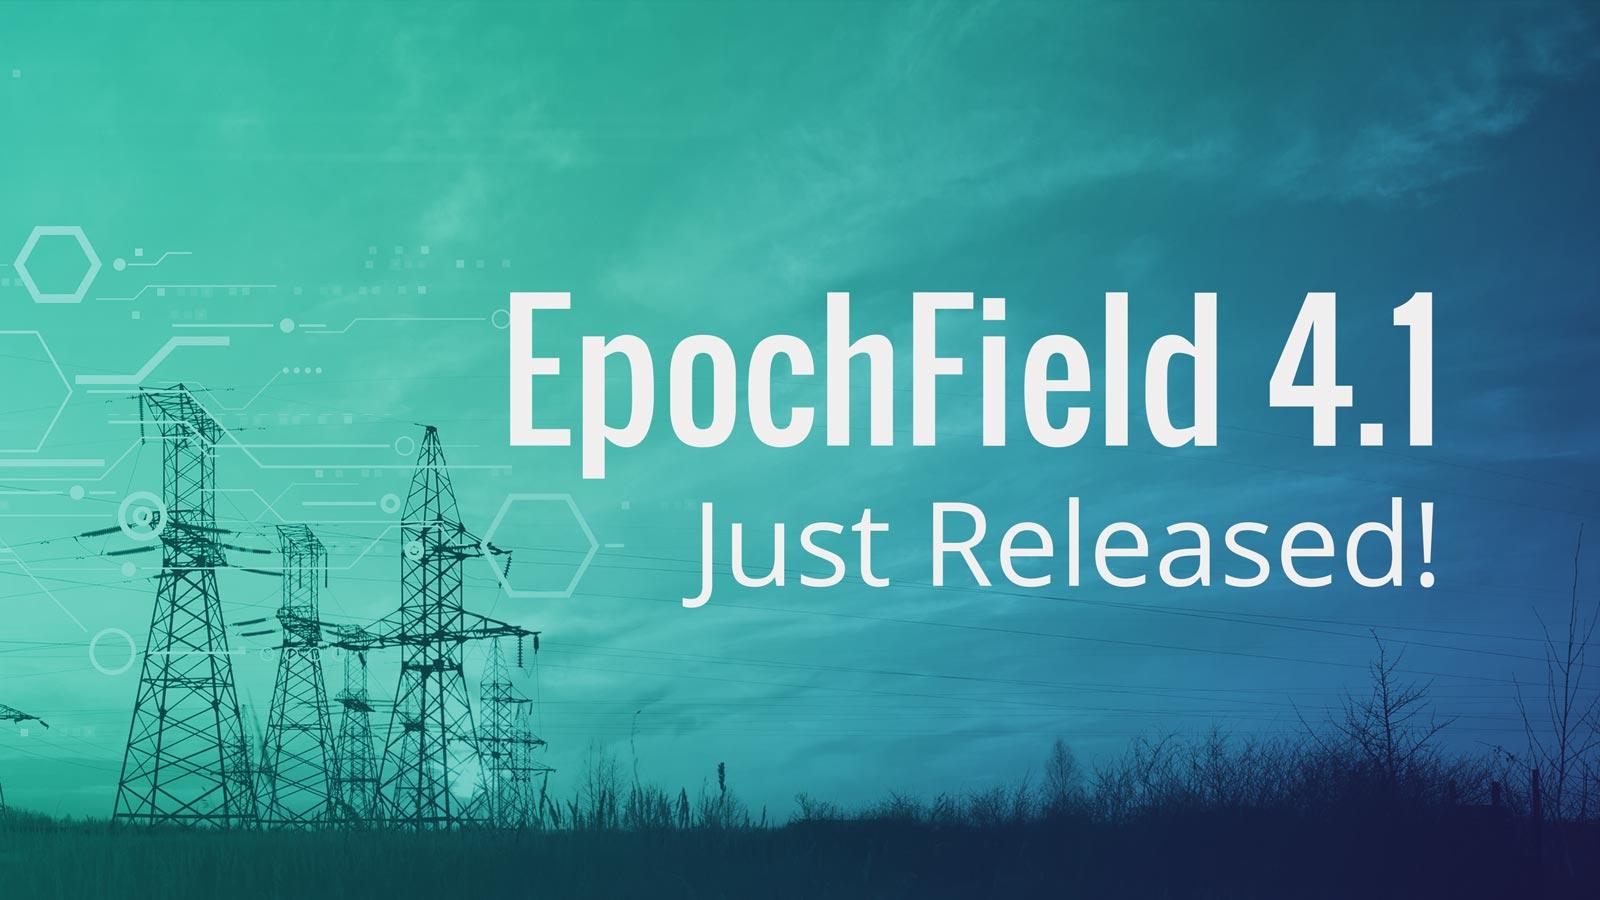 EpochField 4.1 – Just Released!